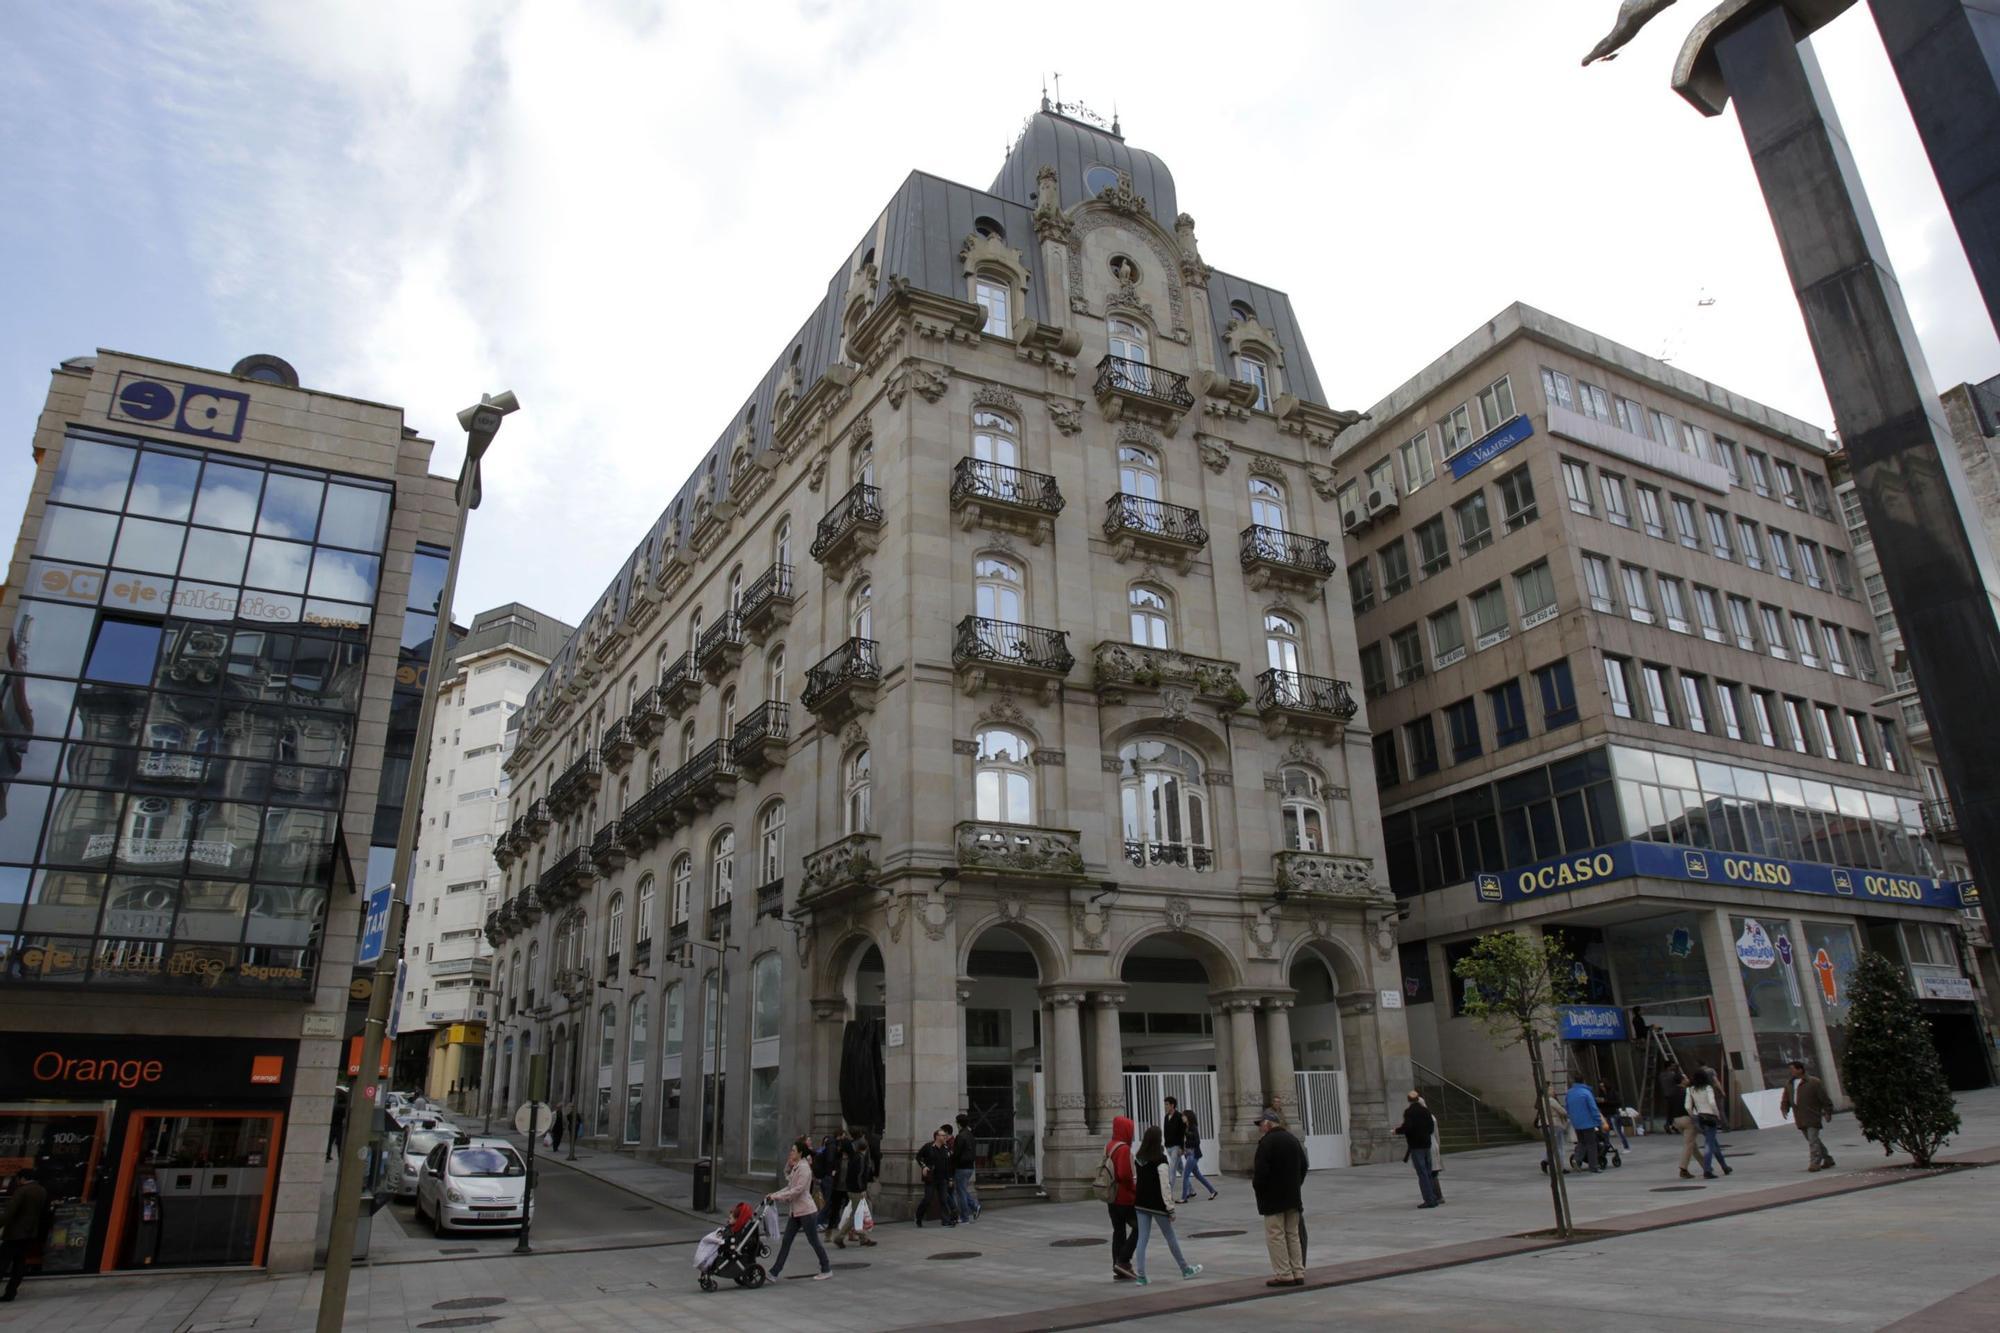 6.edificio simeon jose lores.jpg